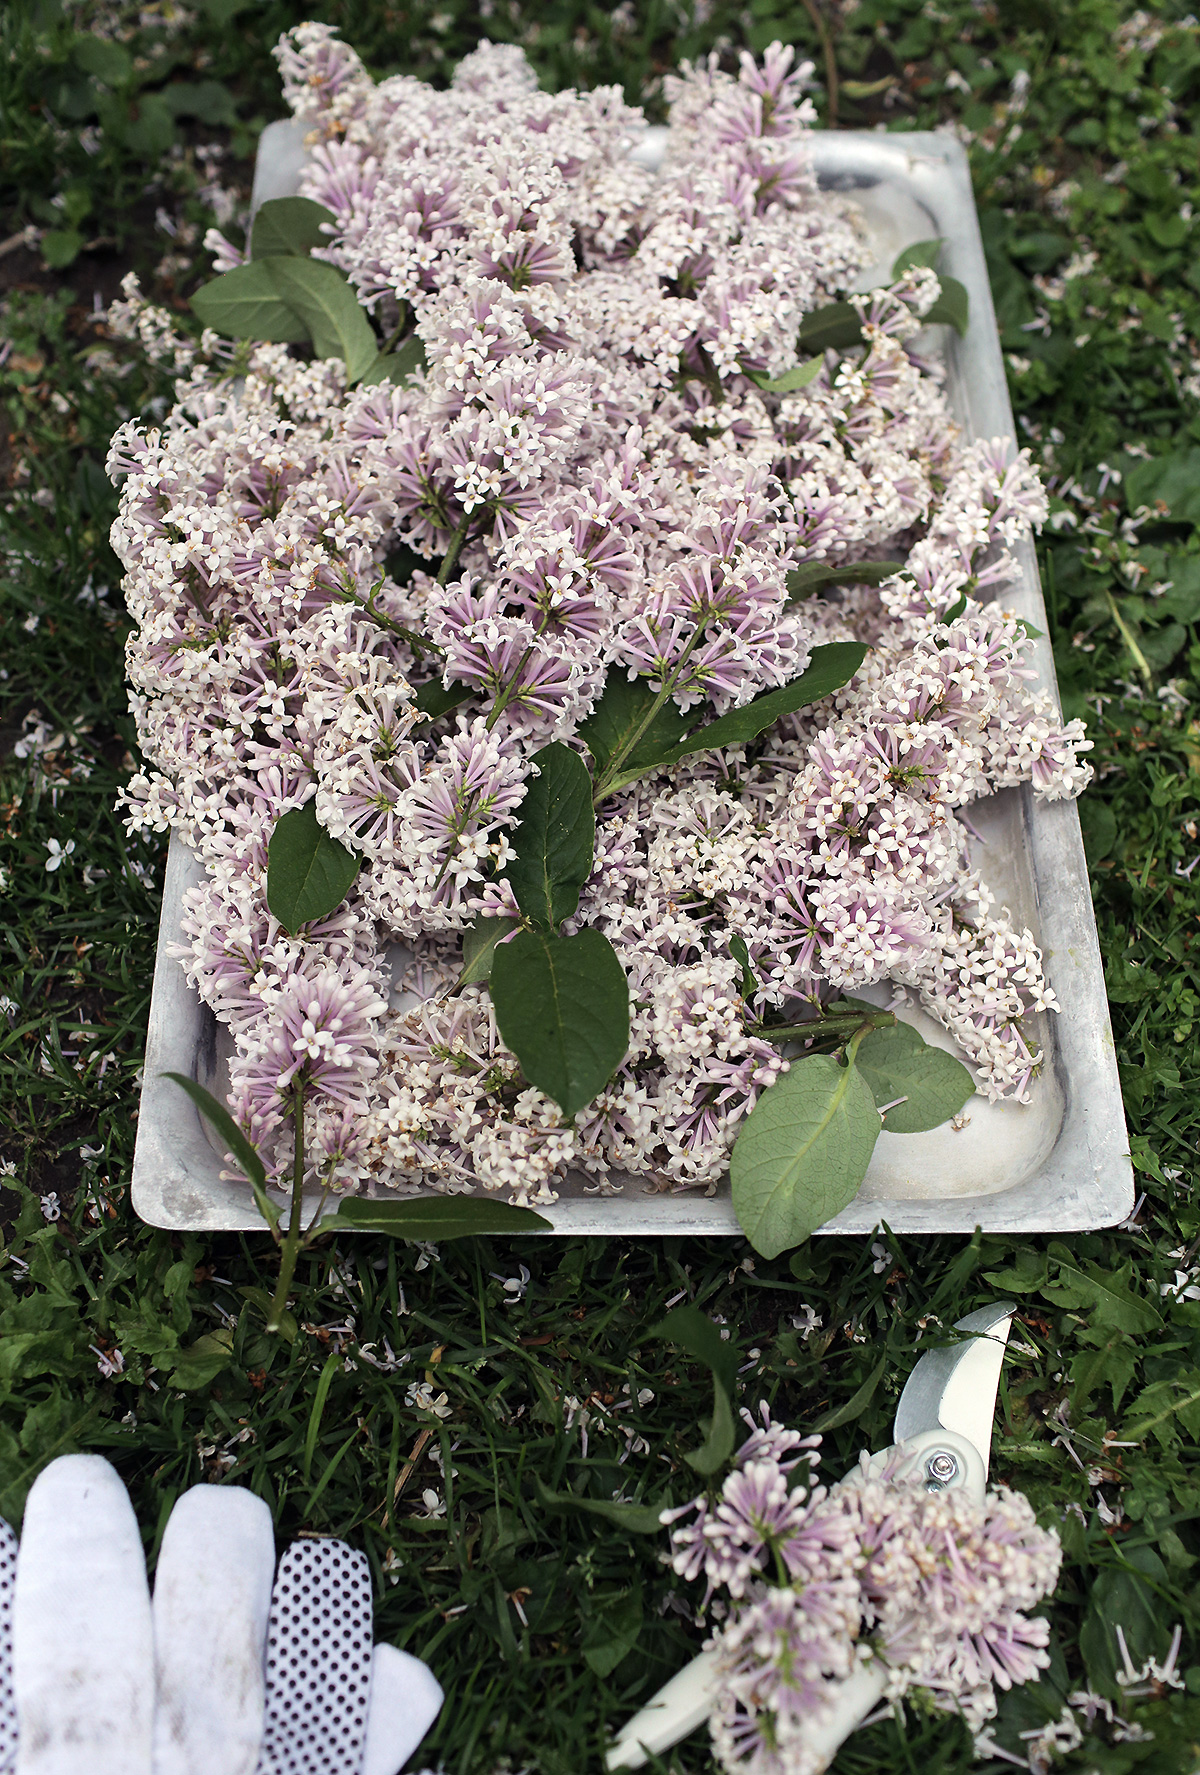 lilac-flowers-garden.jpg